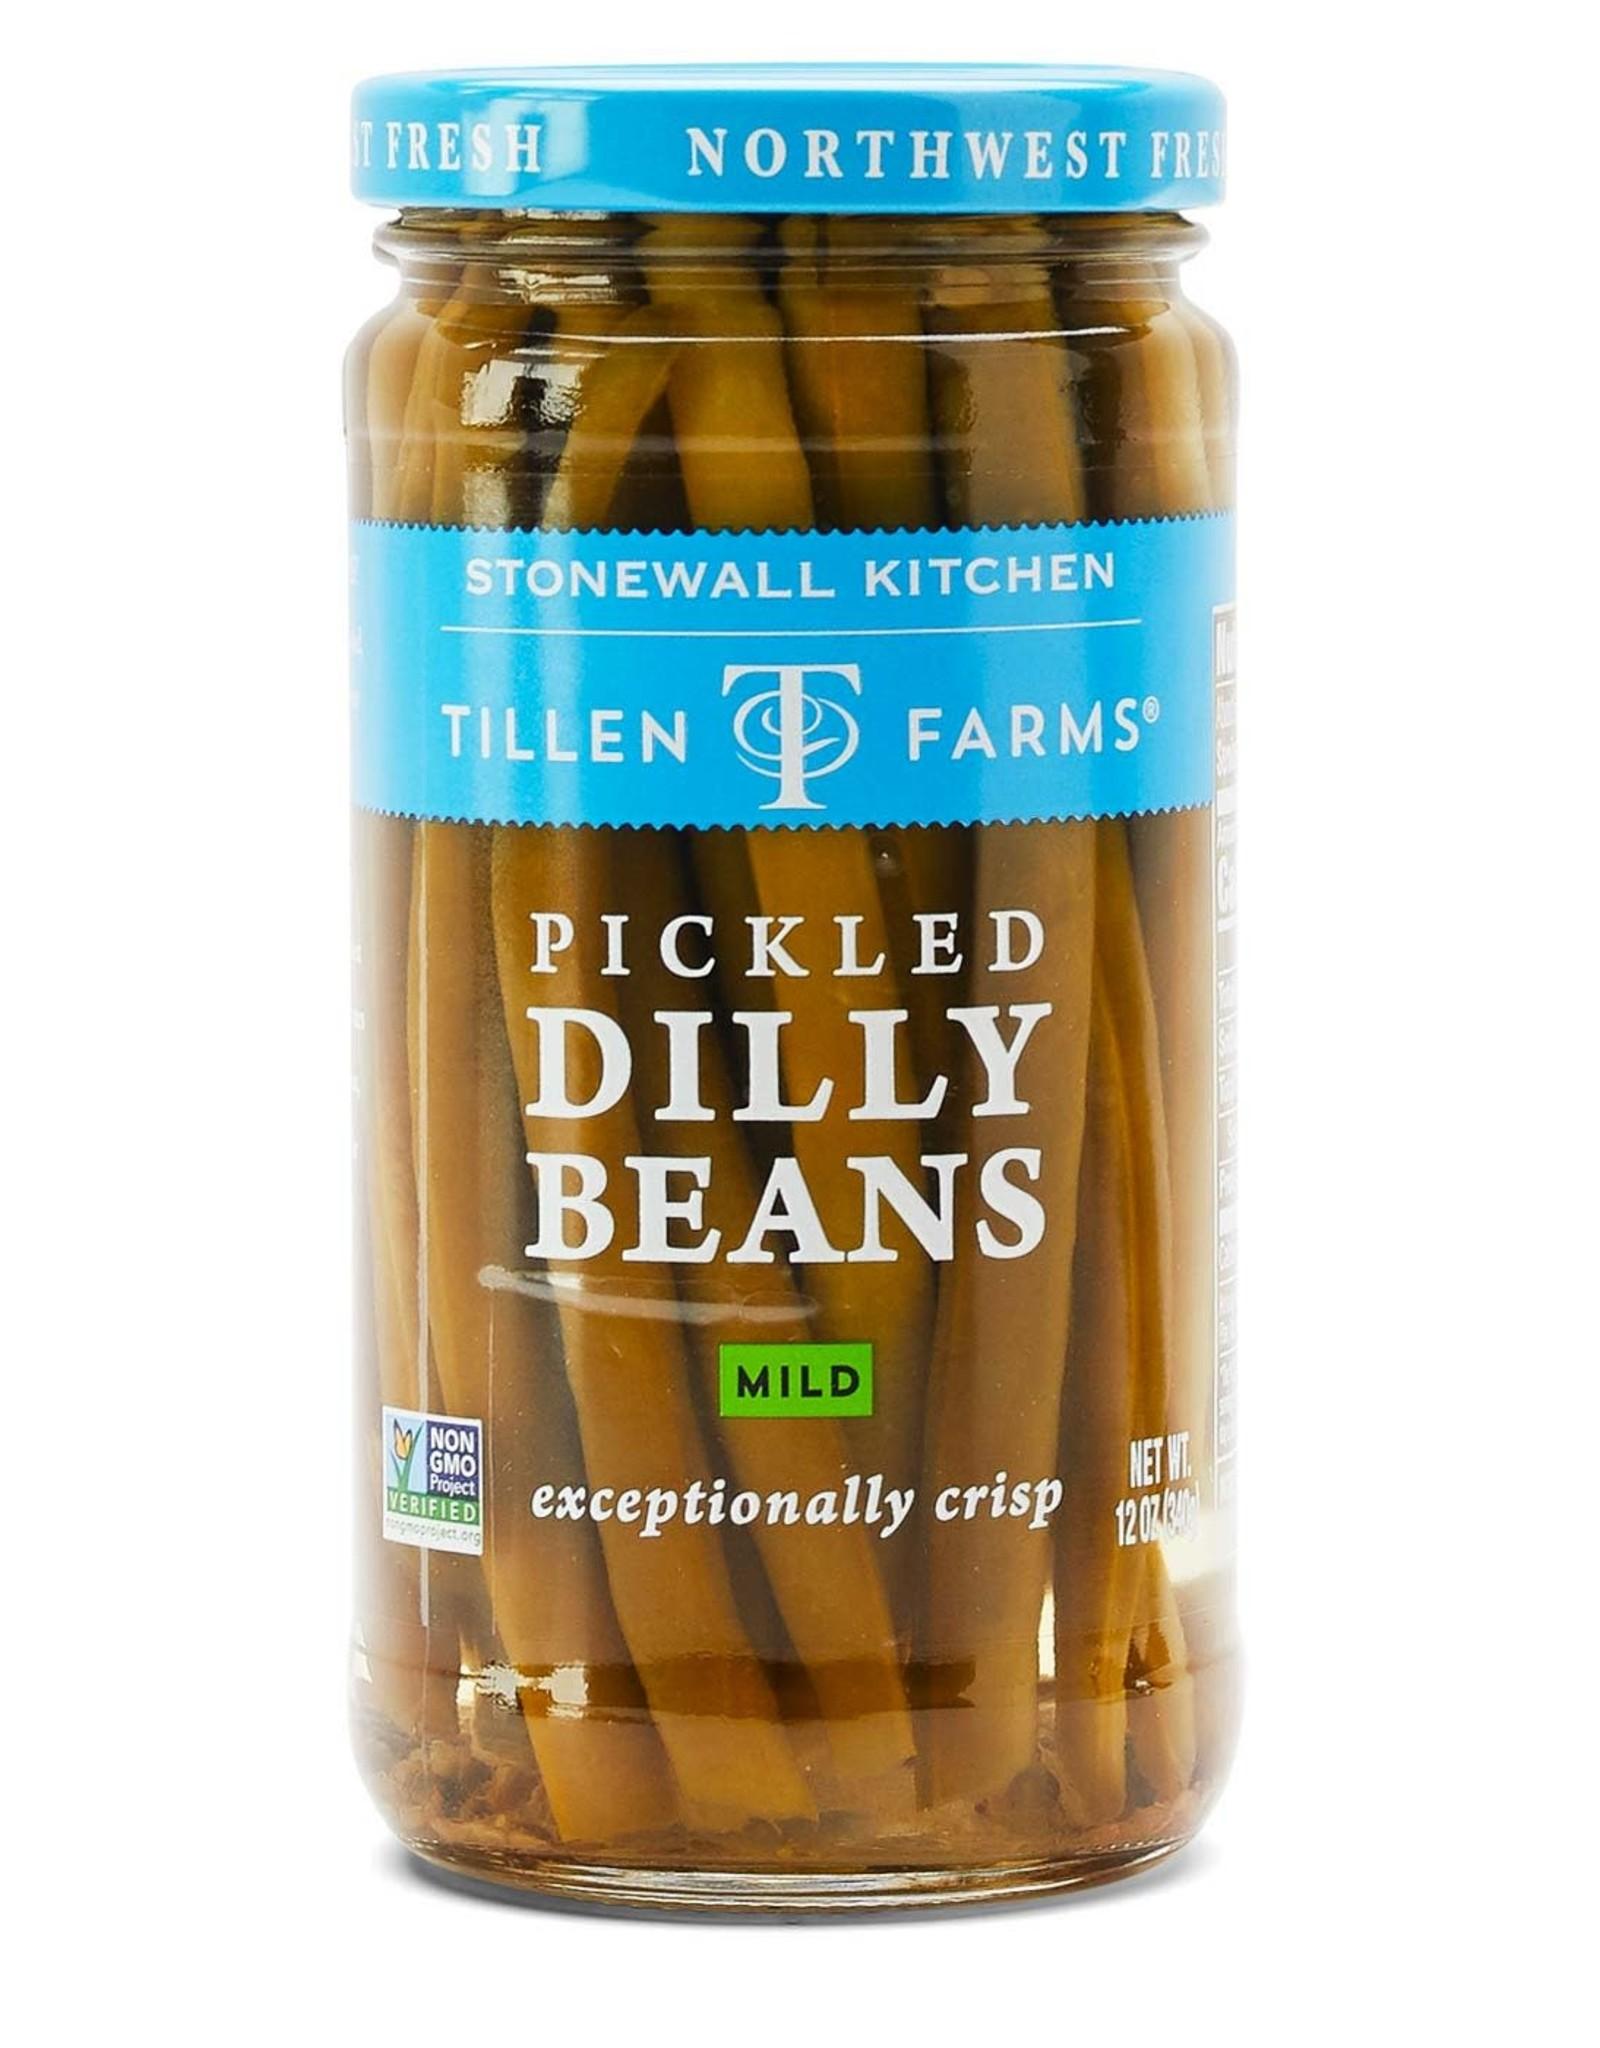 Stonewall Kitchen Tillen Farms Green Beans, Mild